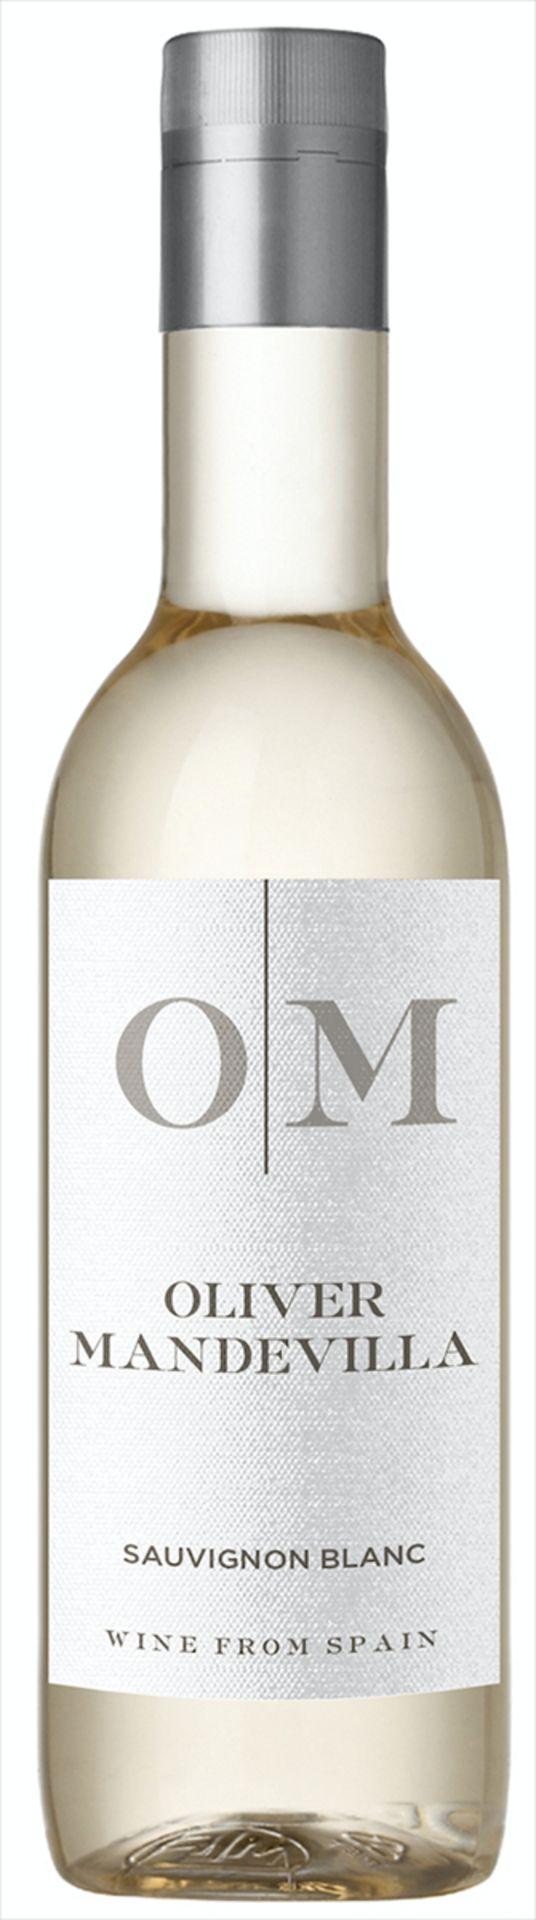 1 x Pallet of Oliver Mandevilla Sauvignon Blanc